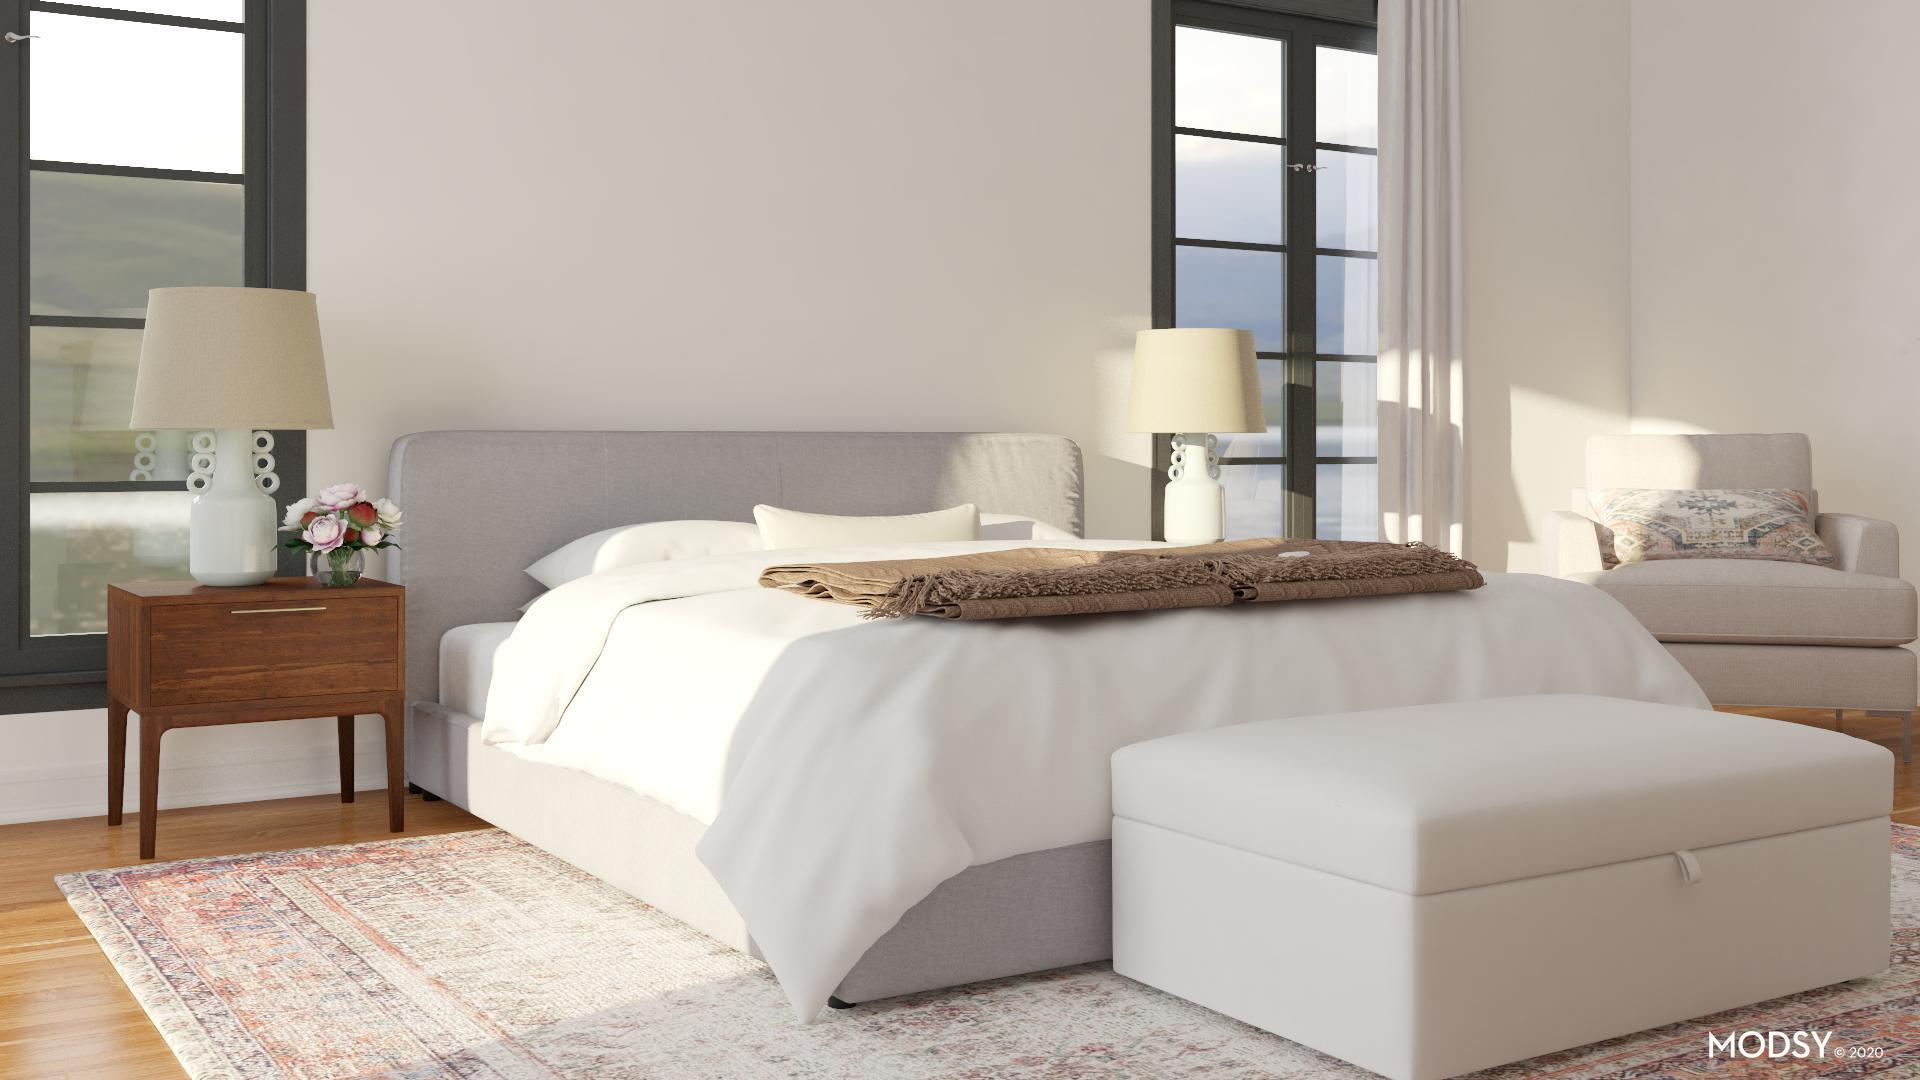 Neutral Minimalist: Get The Look | Contemporary-Style ... on Neutral Minimalist Bedroom Ideas  id=91085